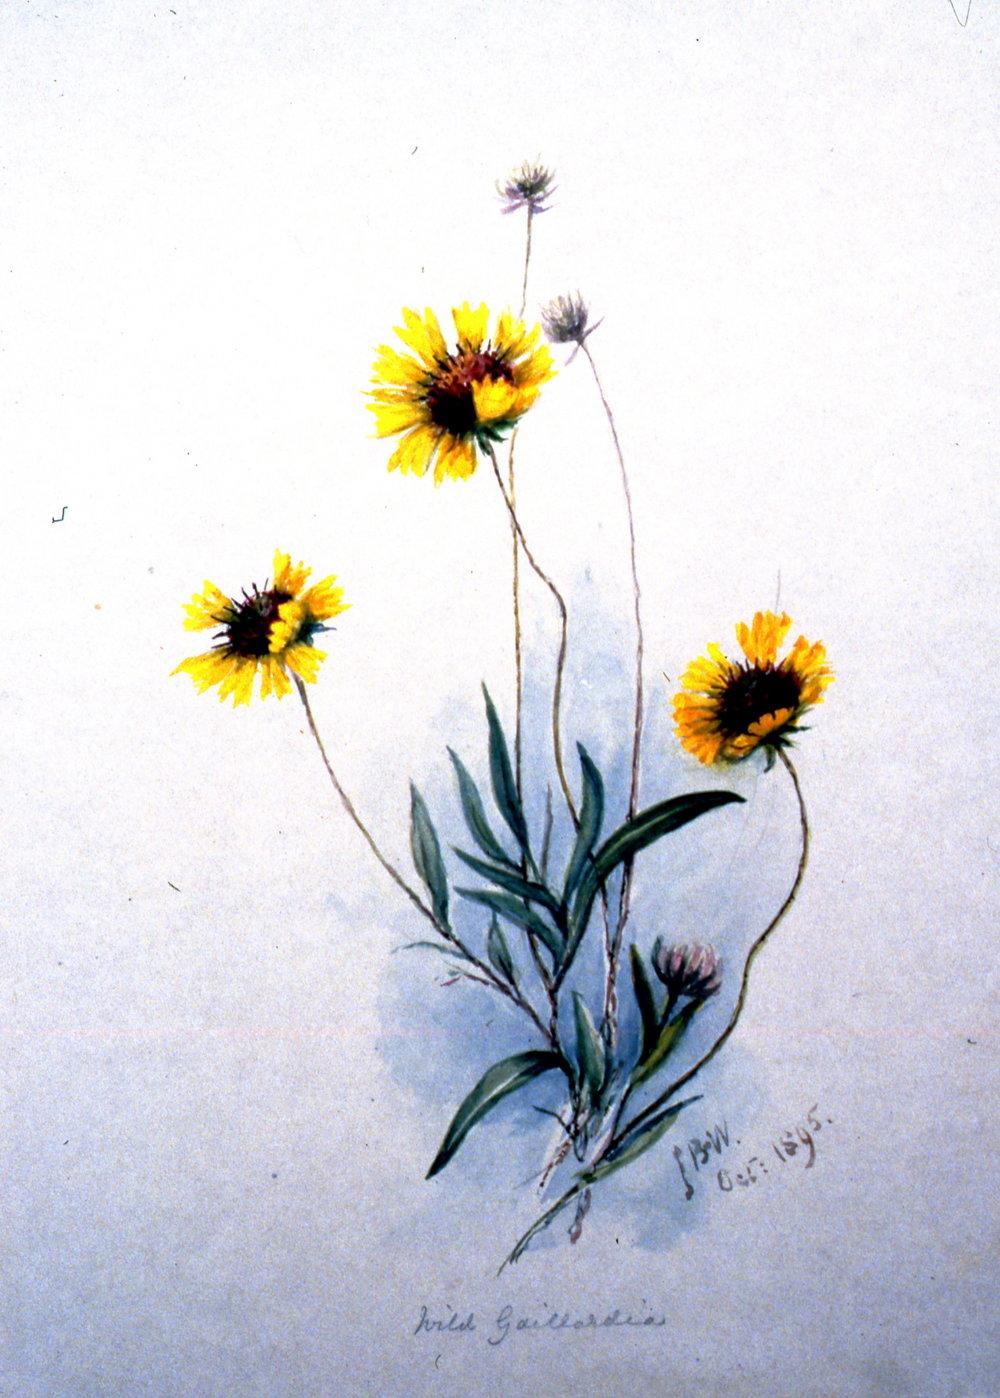 Wild Gaillardia , 1895, Julia Bullock Webster,watercolour on paper. 35.5 x 25.5 cm, 1983.02.28. Gift of Mrs. Barbara Steel.